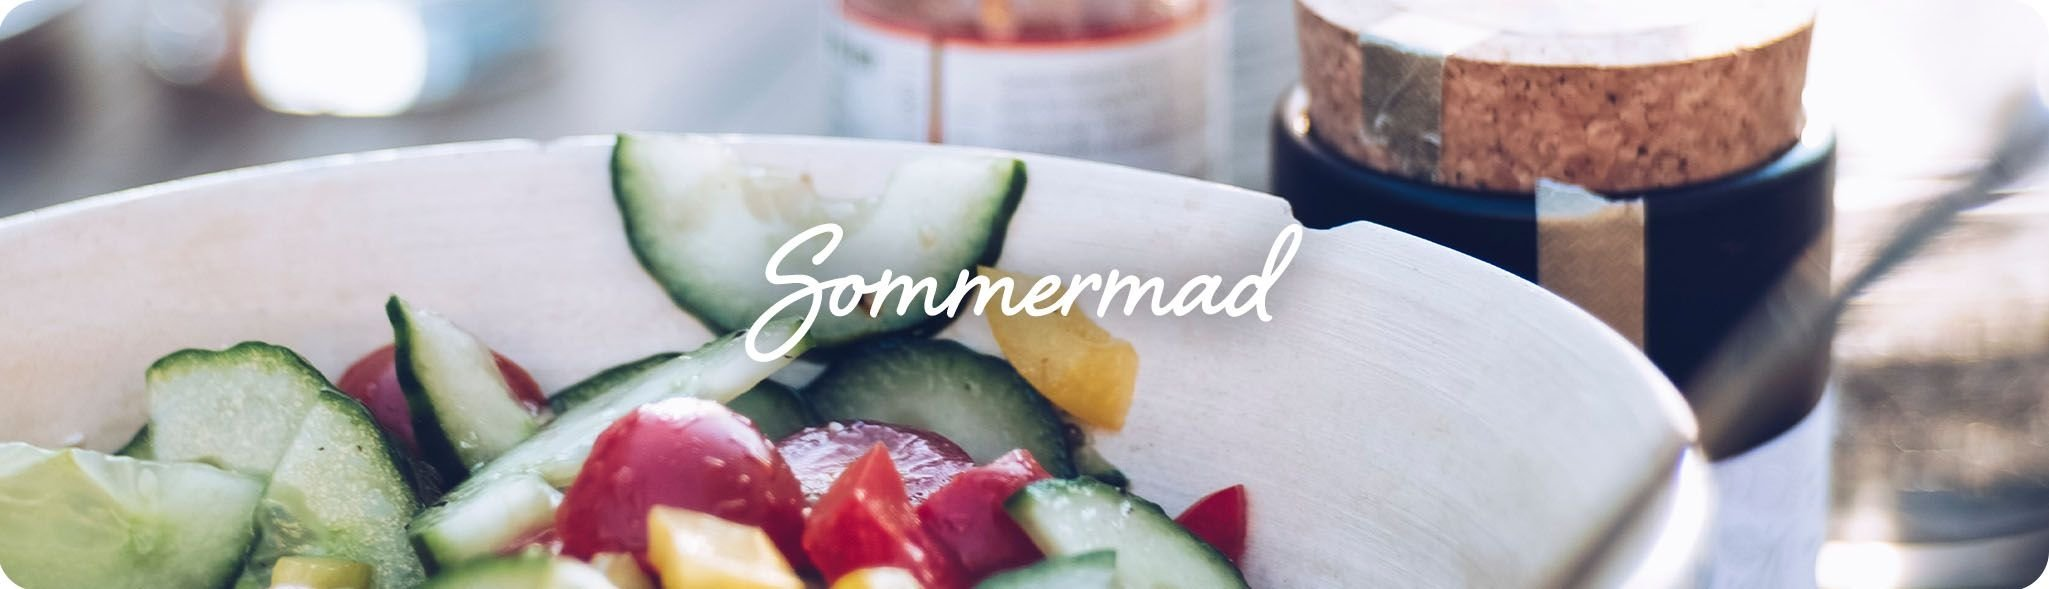 Sommermad